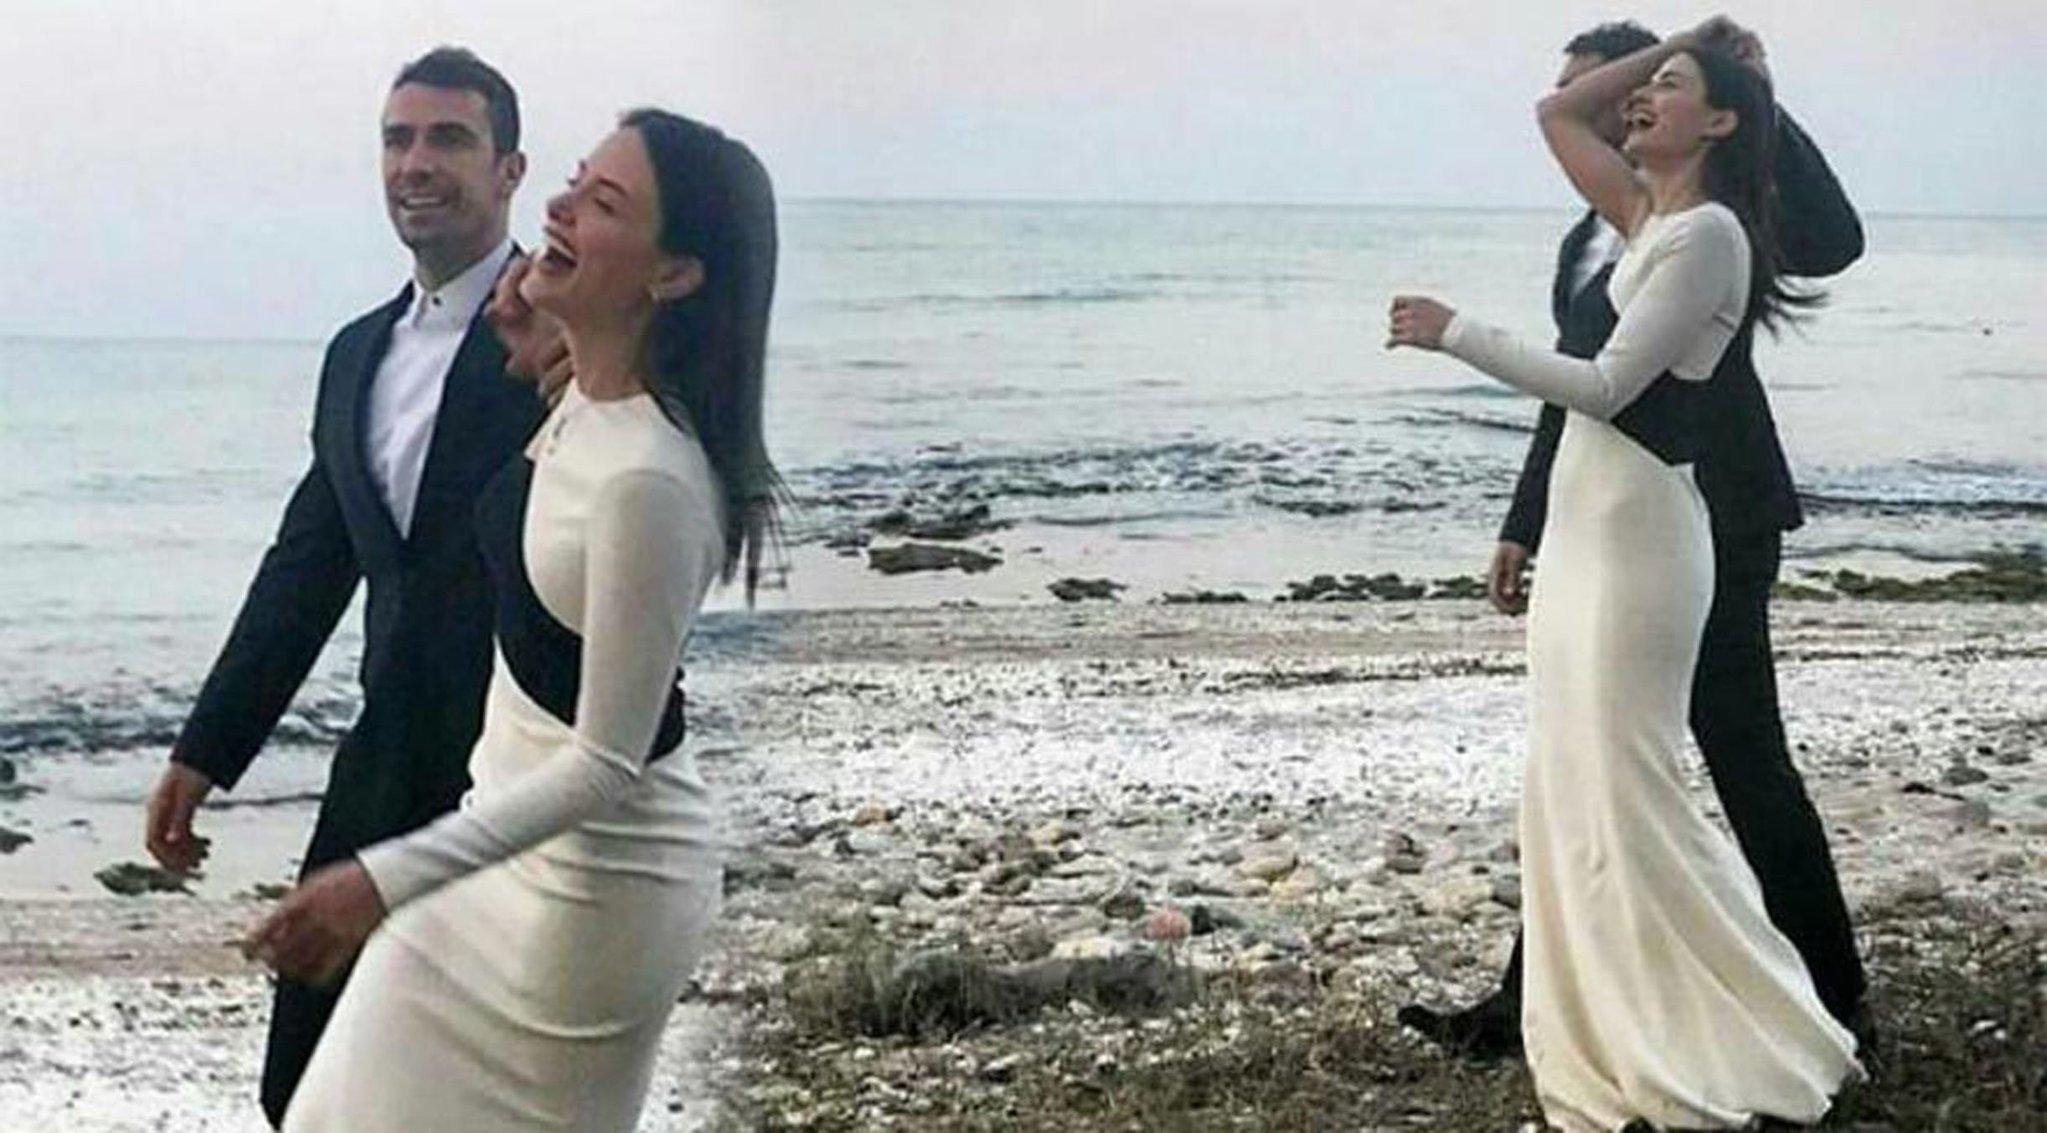 Ибрагим Челиккол и Михрам Мутлу свадьба